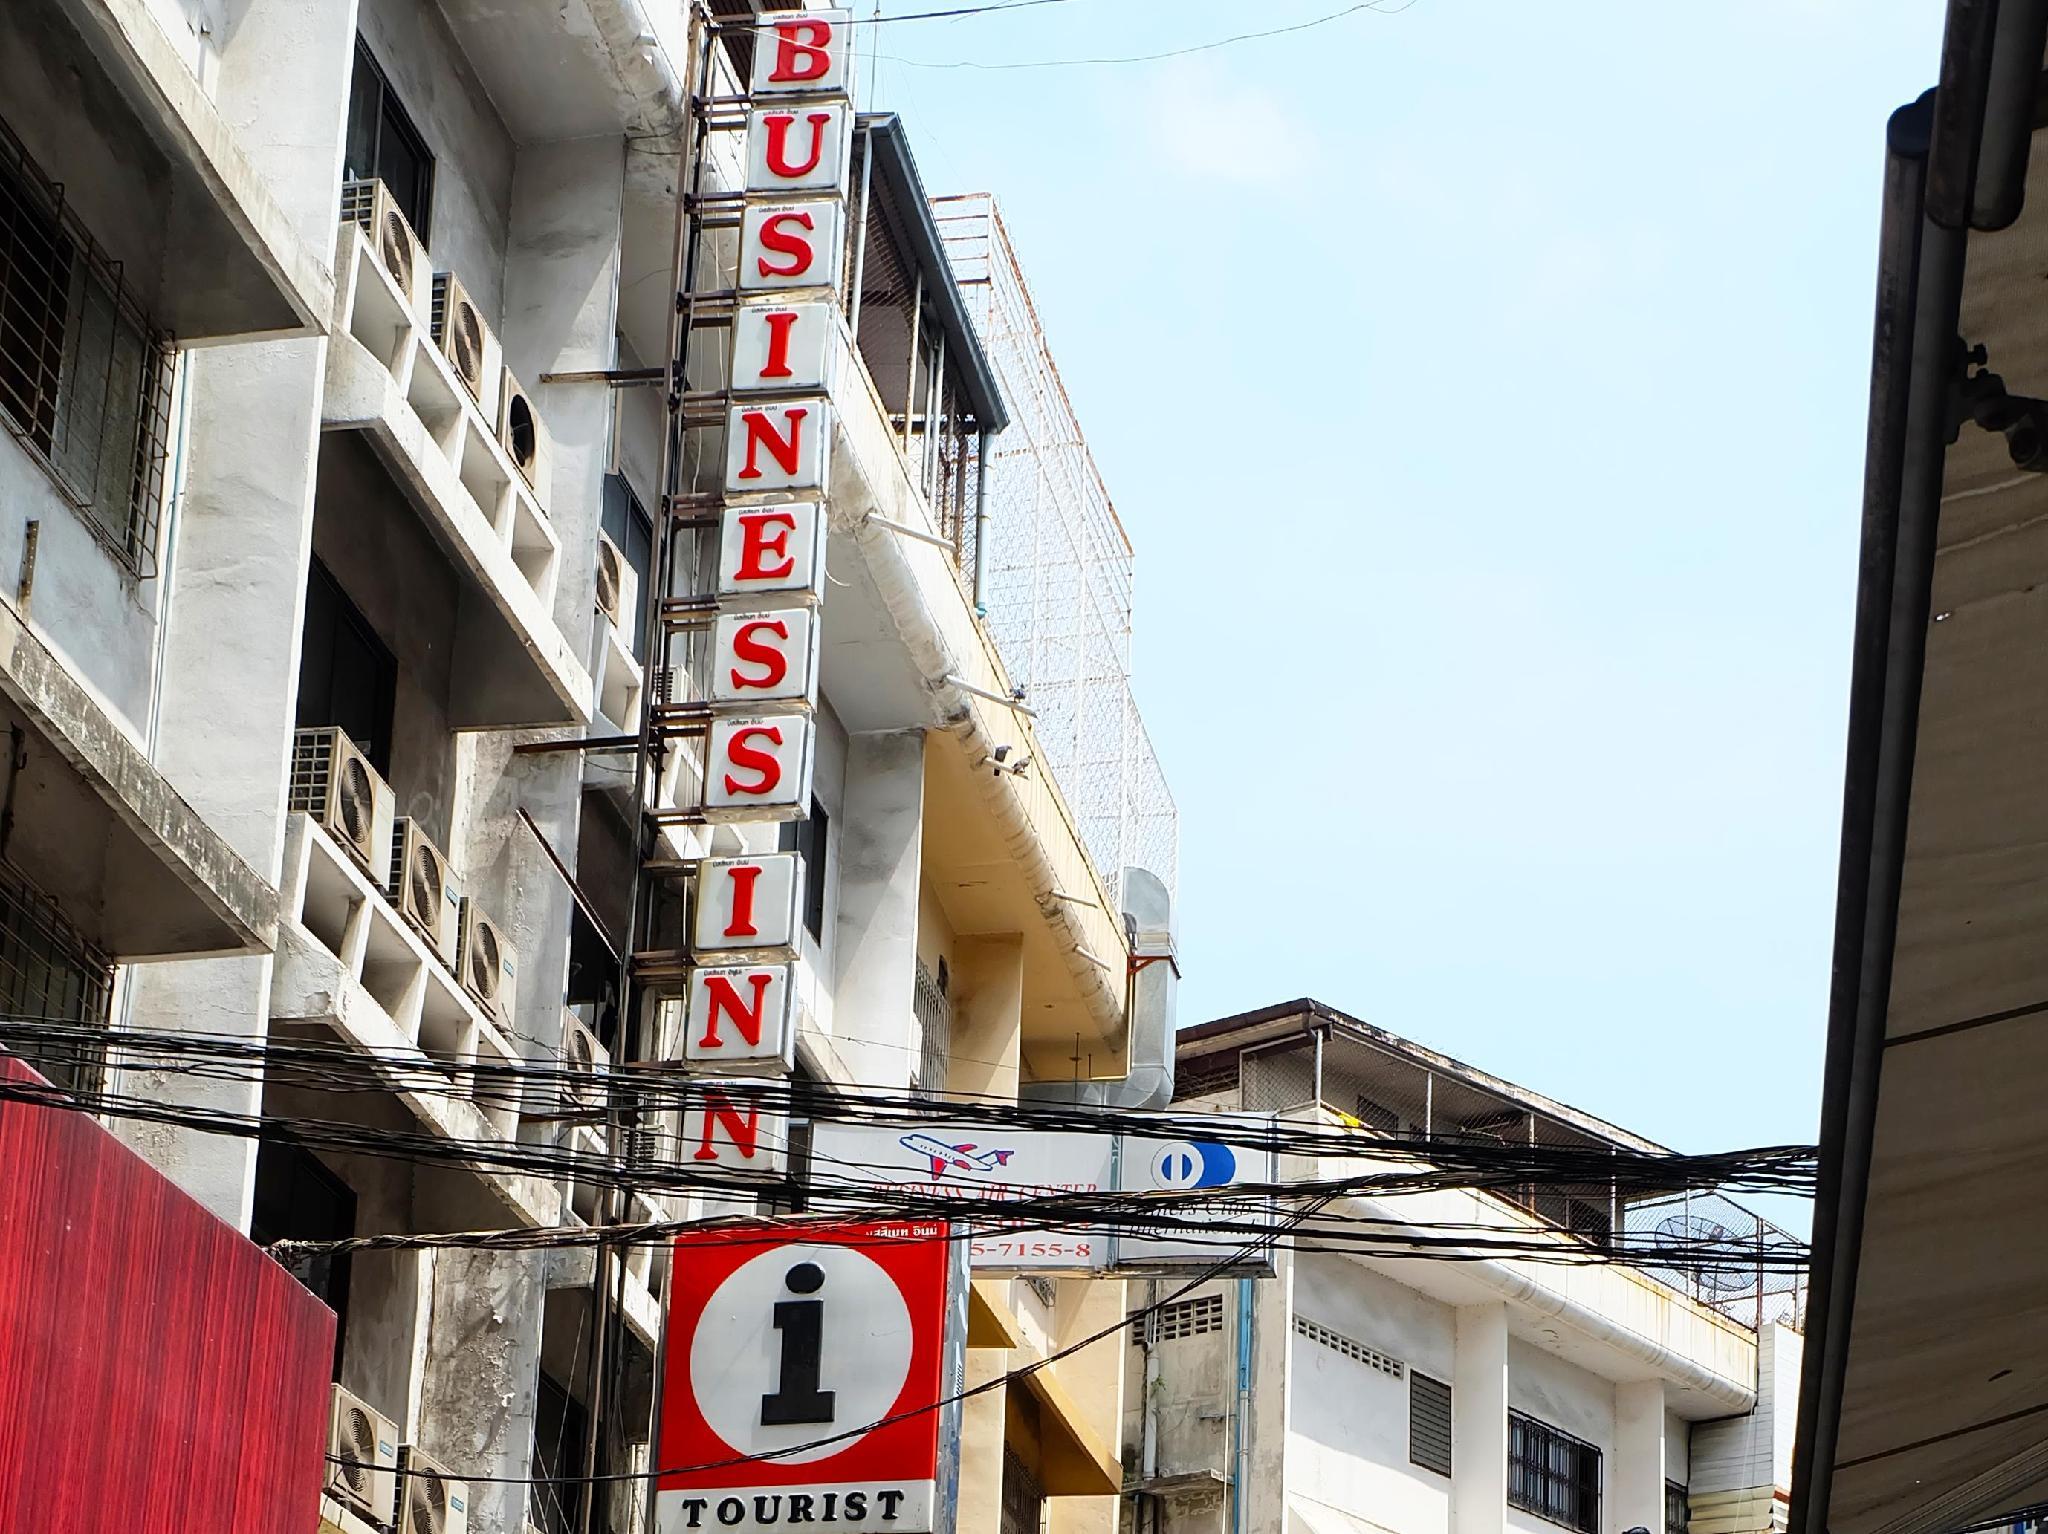 Sukhumvit 11 Business Inn By Bunk Bangkok Thailand